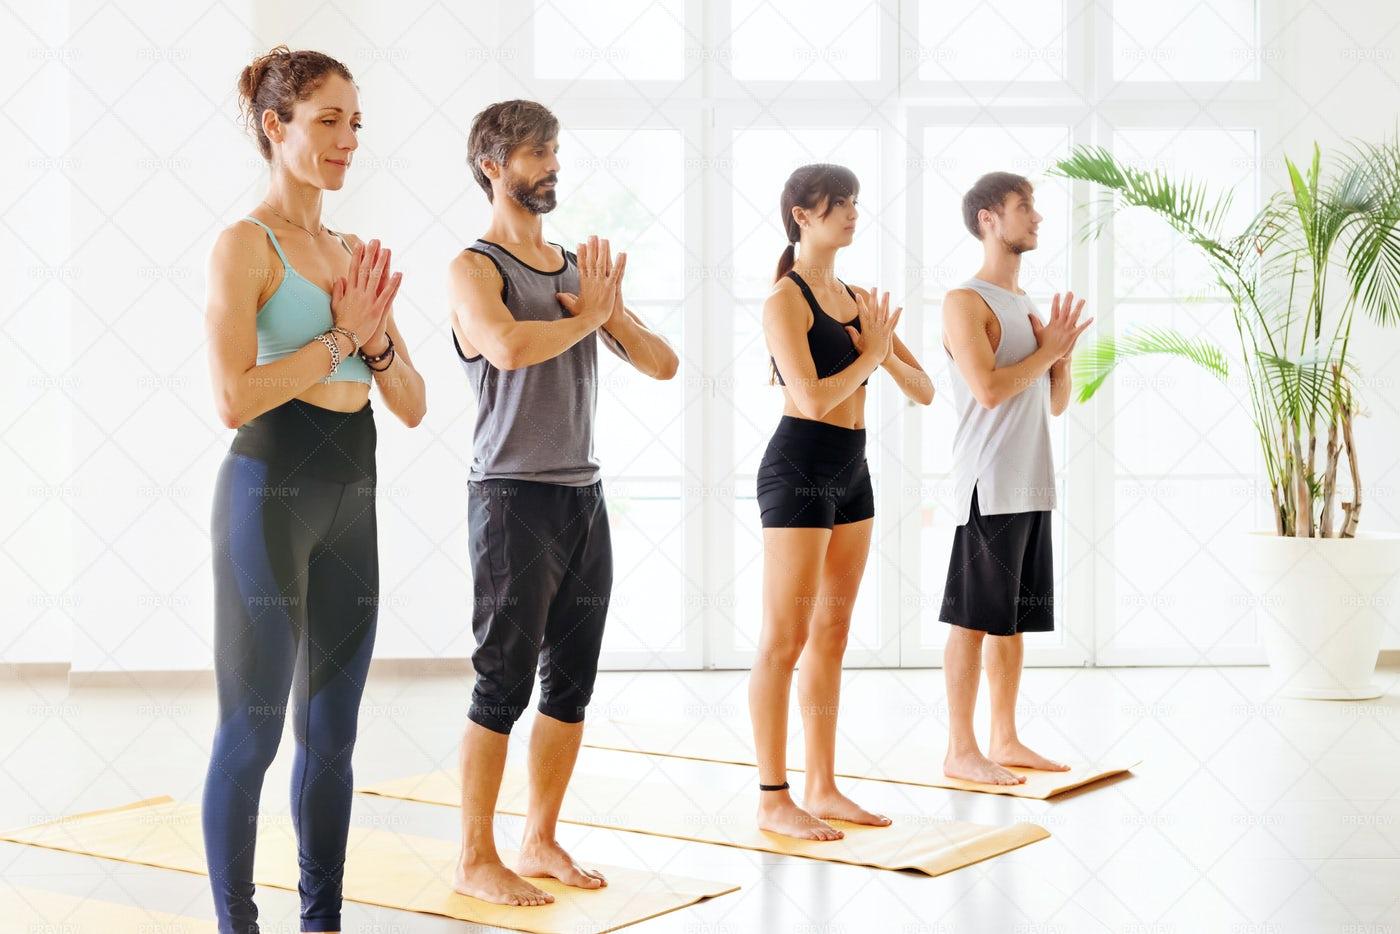 People Practicing Yoga: Stock Photos